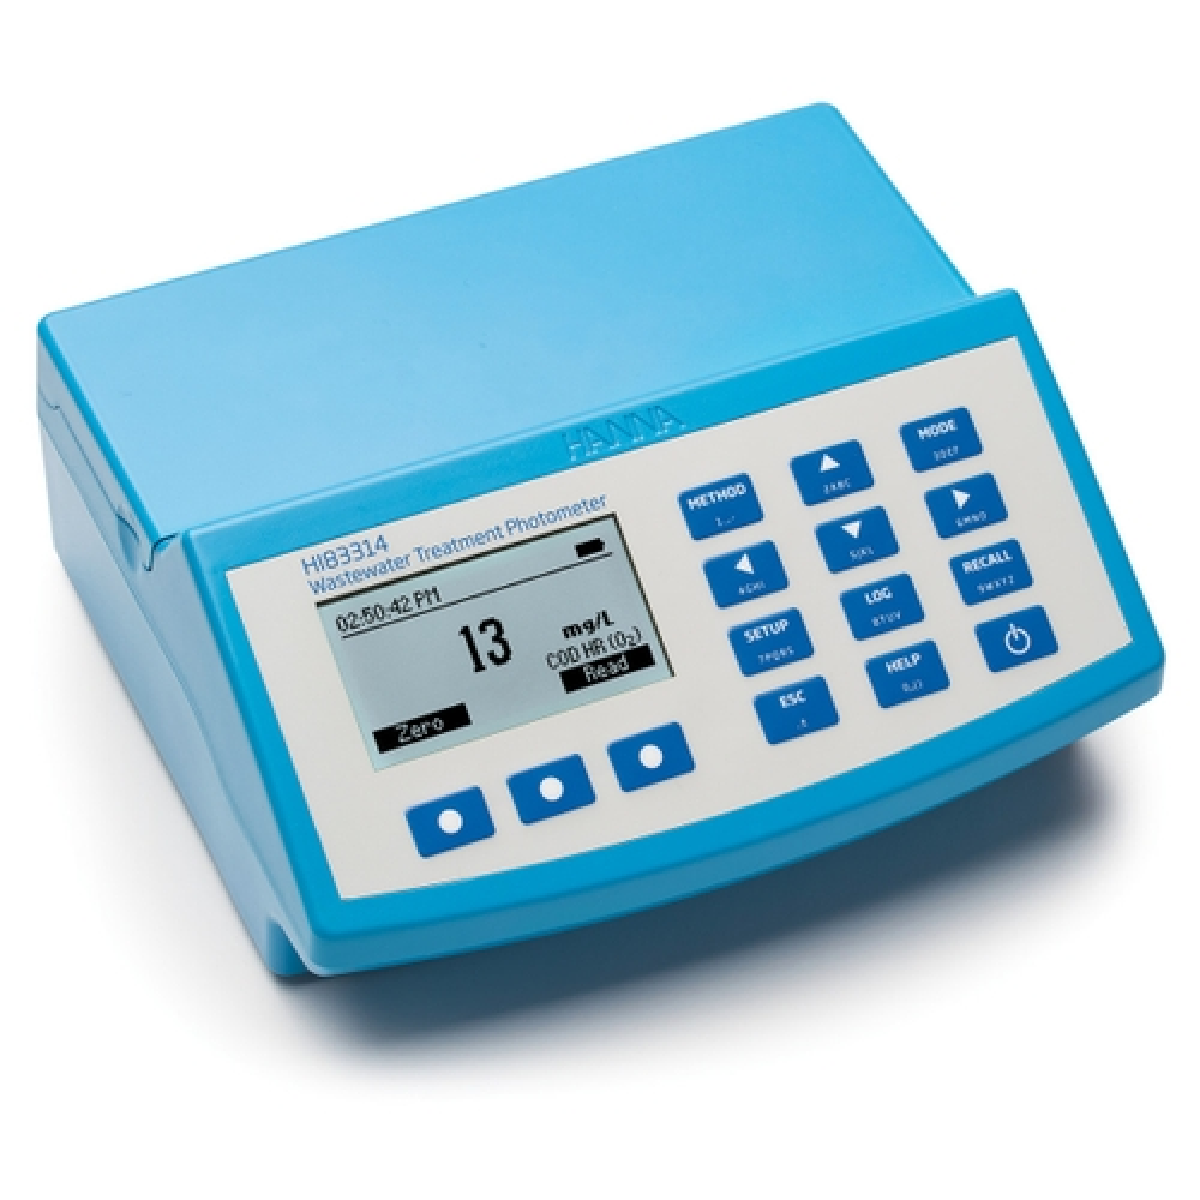 HI83314 Wastewater Multiparameter Benchtop COD Photometer and pH meter